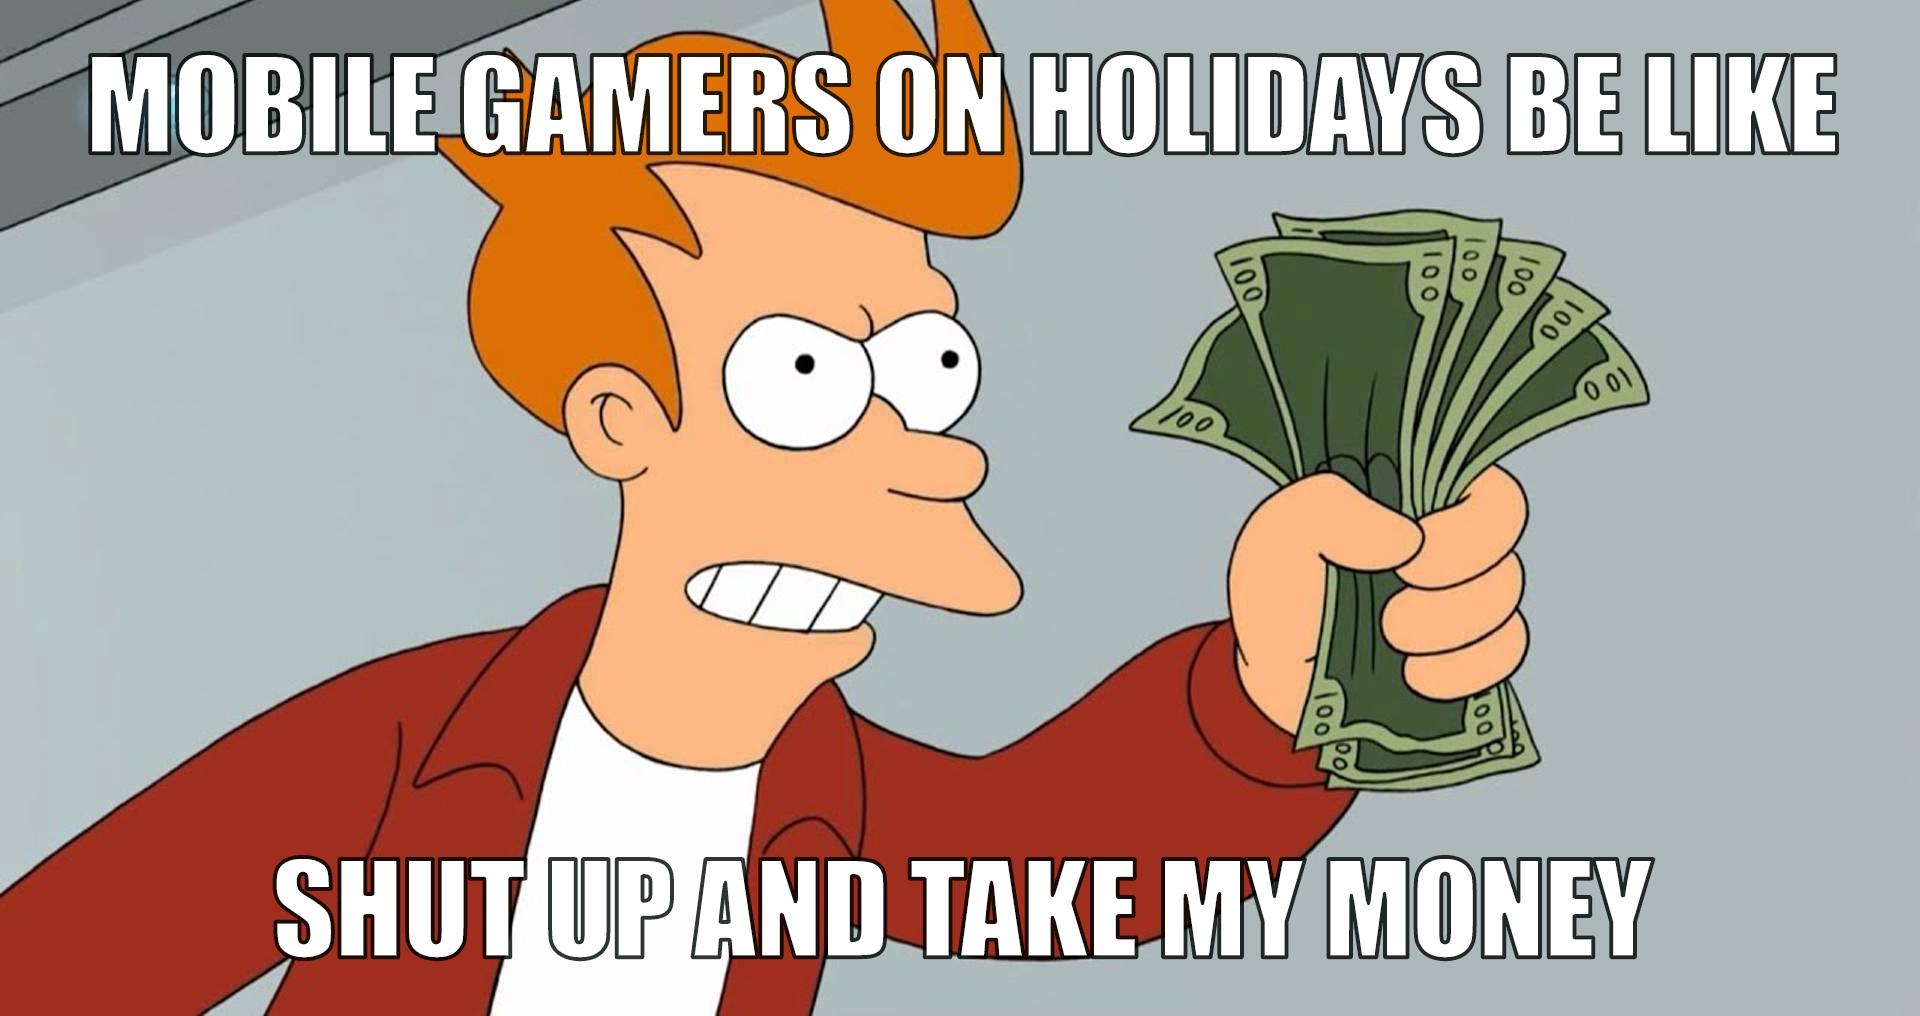 Mobile-gamers-holiday-season-shut-up-take-money